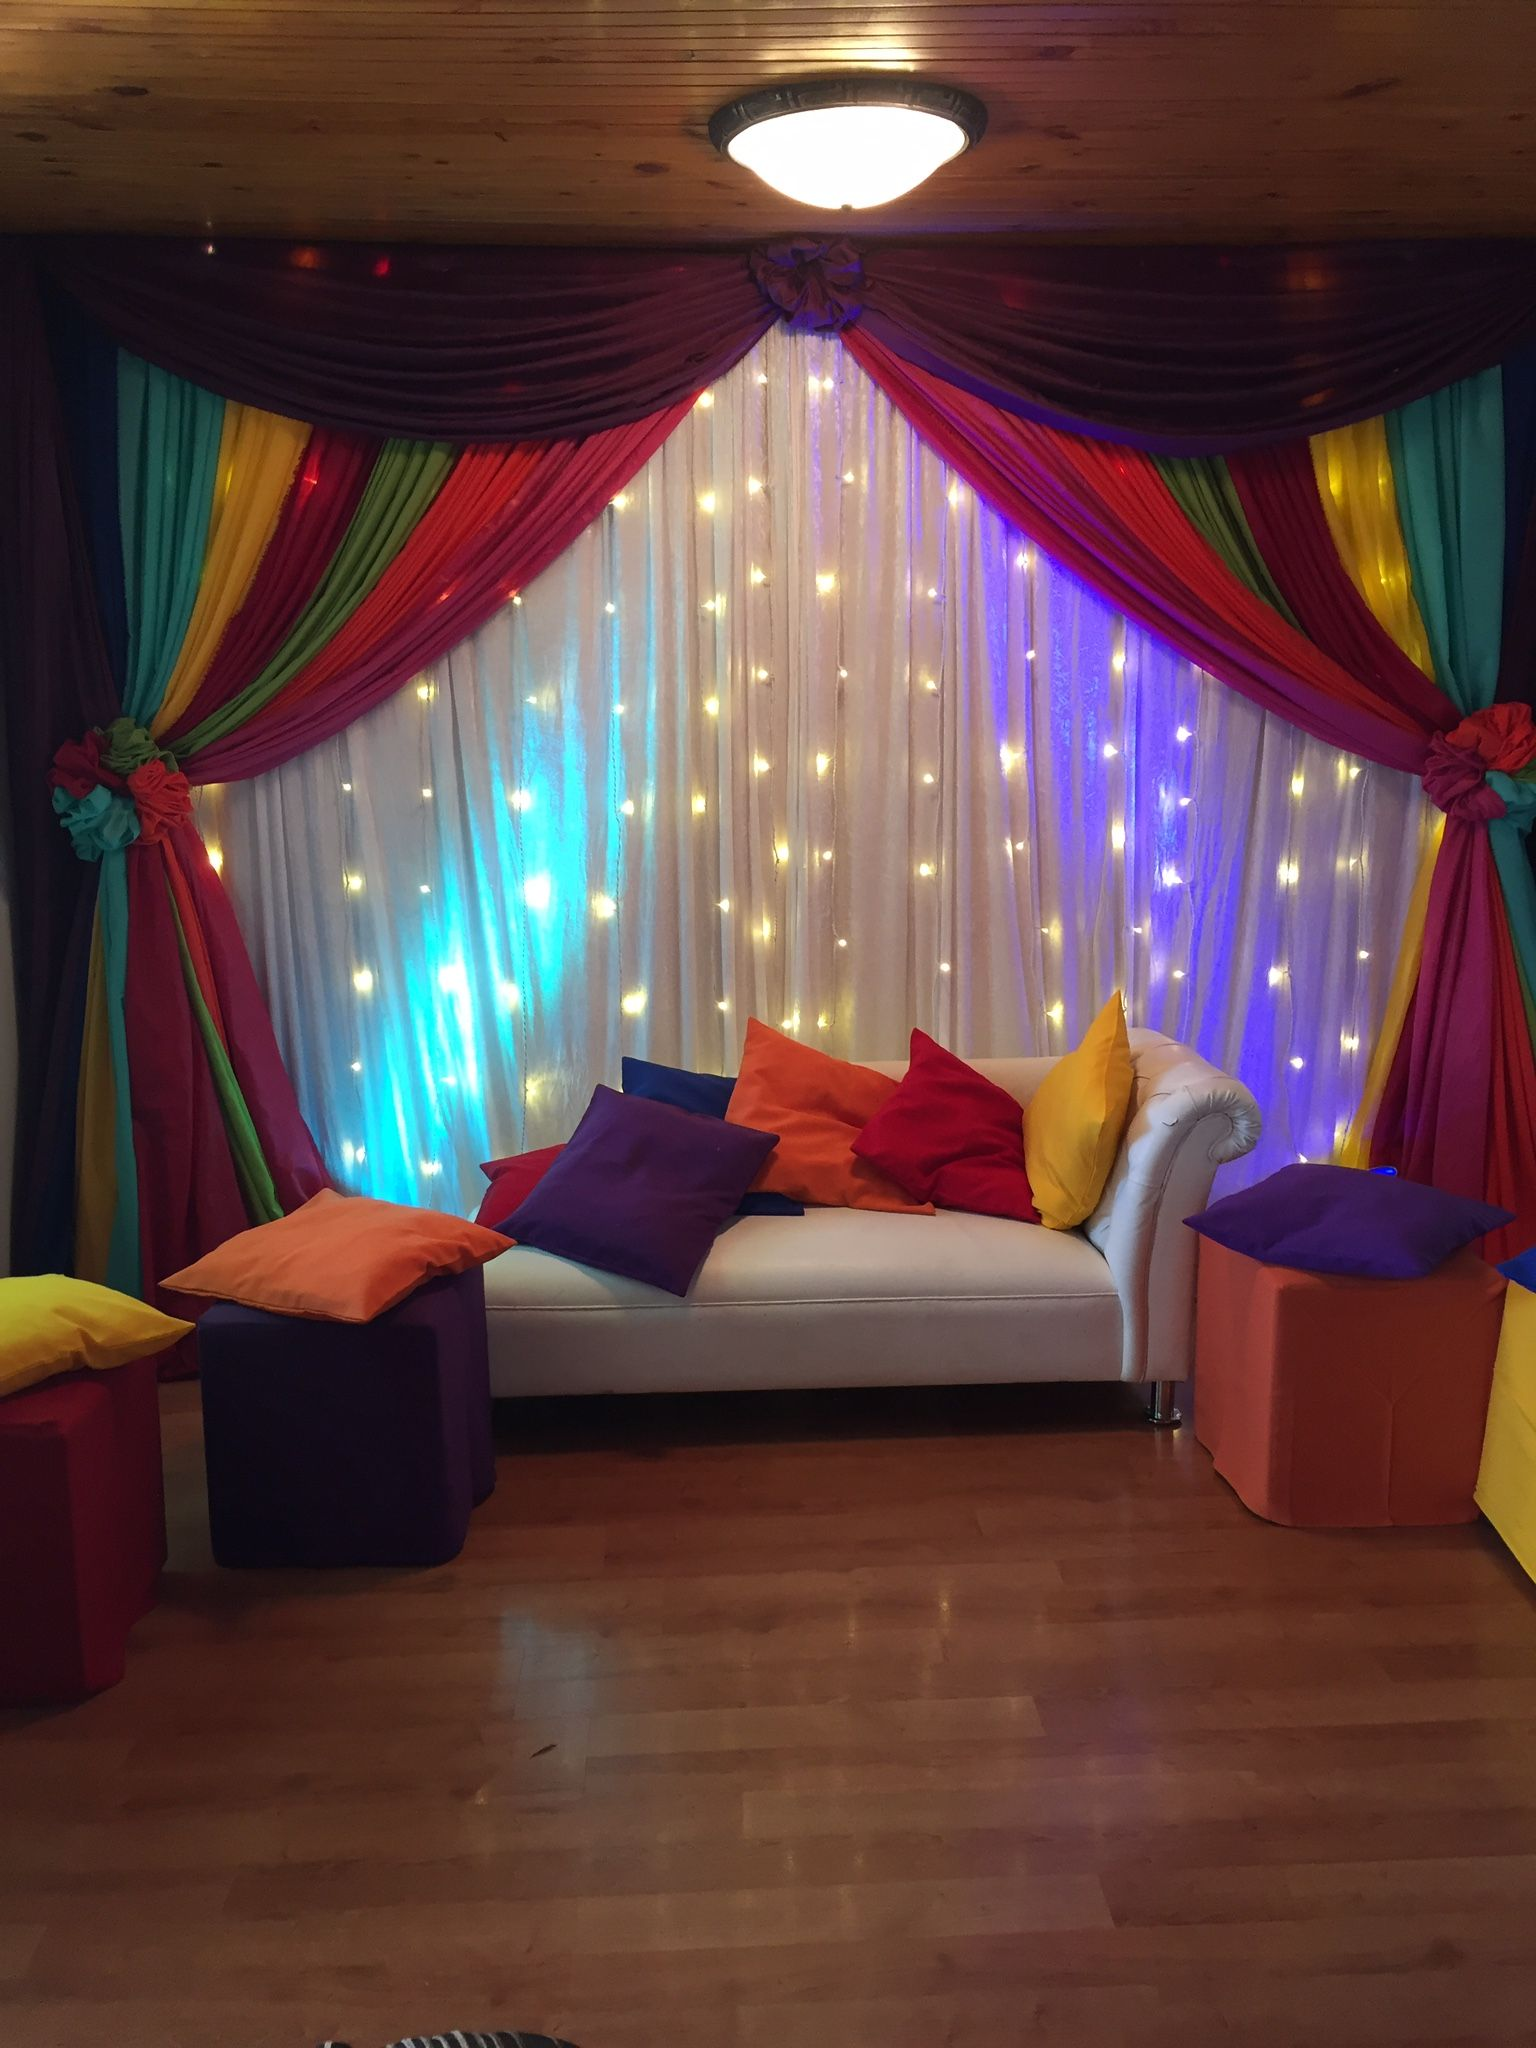 Wedding stage decor ideas  Colourful indoor Mehndi decor u  mehndi night  Pinteu